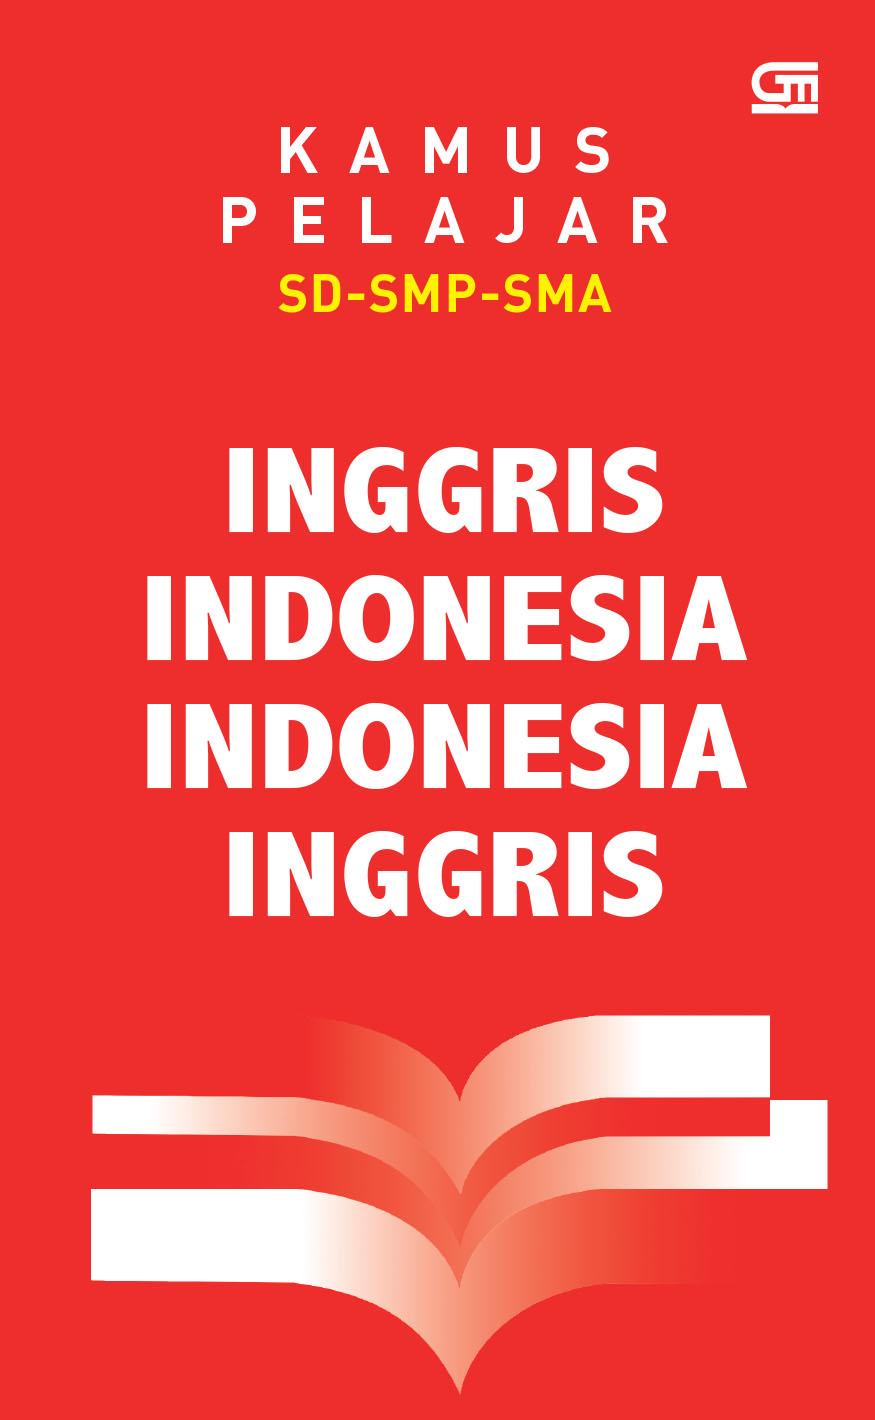 Kamus Pelajar: Inggris-Indonesia, Indonesia-Inggris